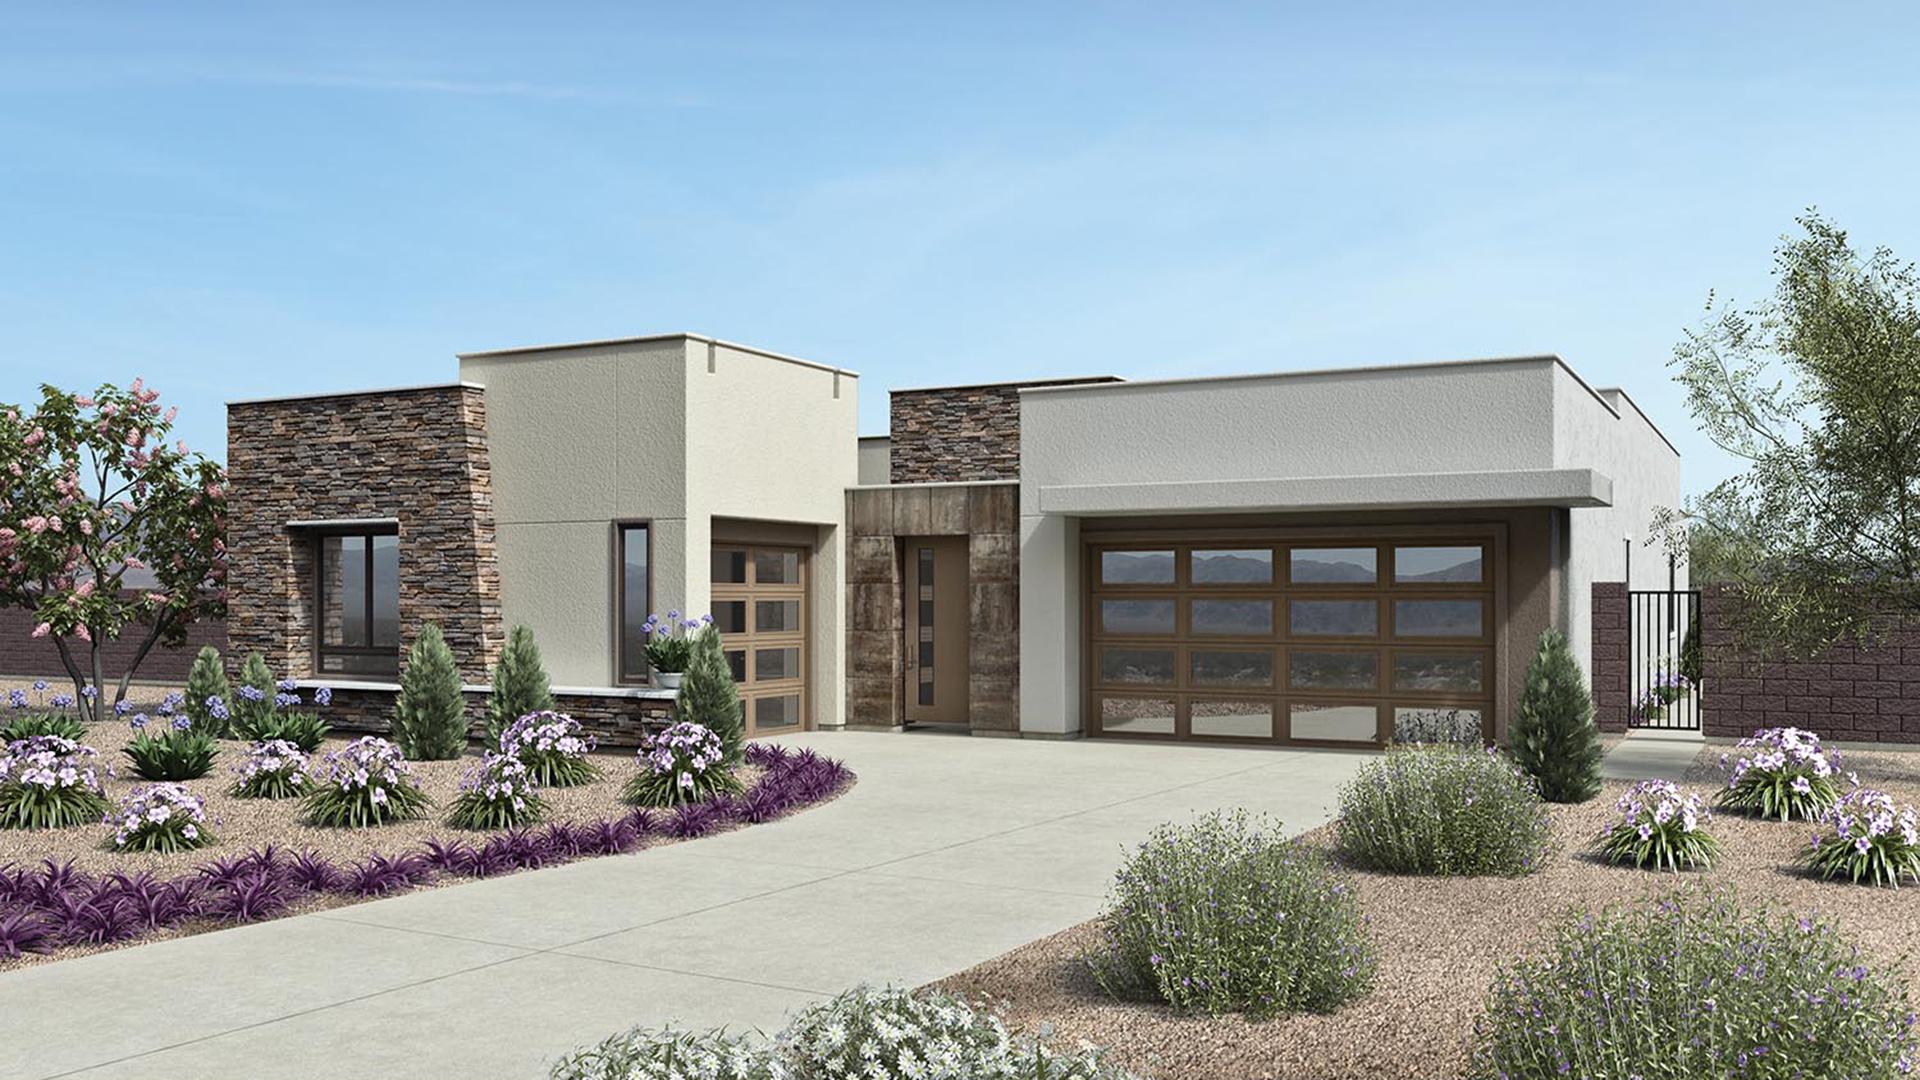 Ironwood | The Cobalt Home Design on Ironwood Kitchenette  id=25039